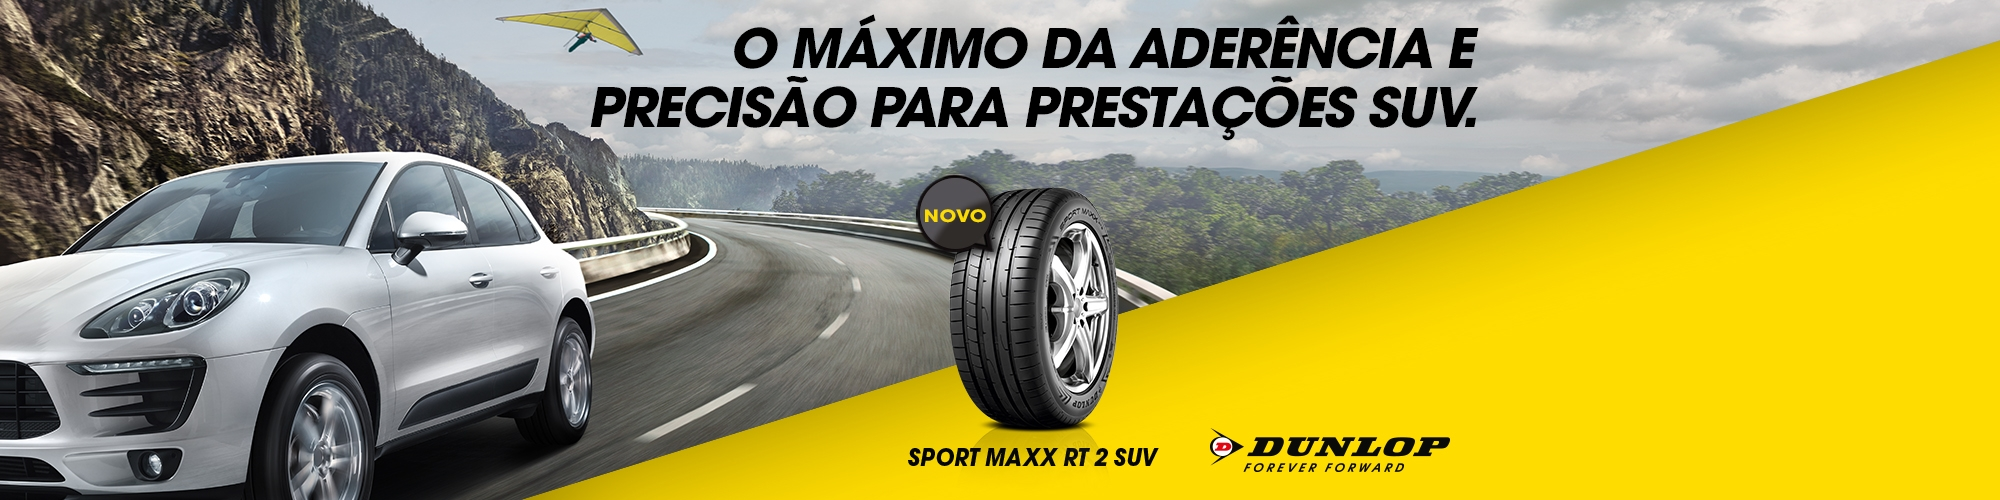 DUNLOP - NOVO SPORT MAXX RT 2 SUV